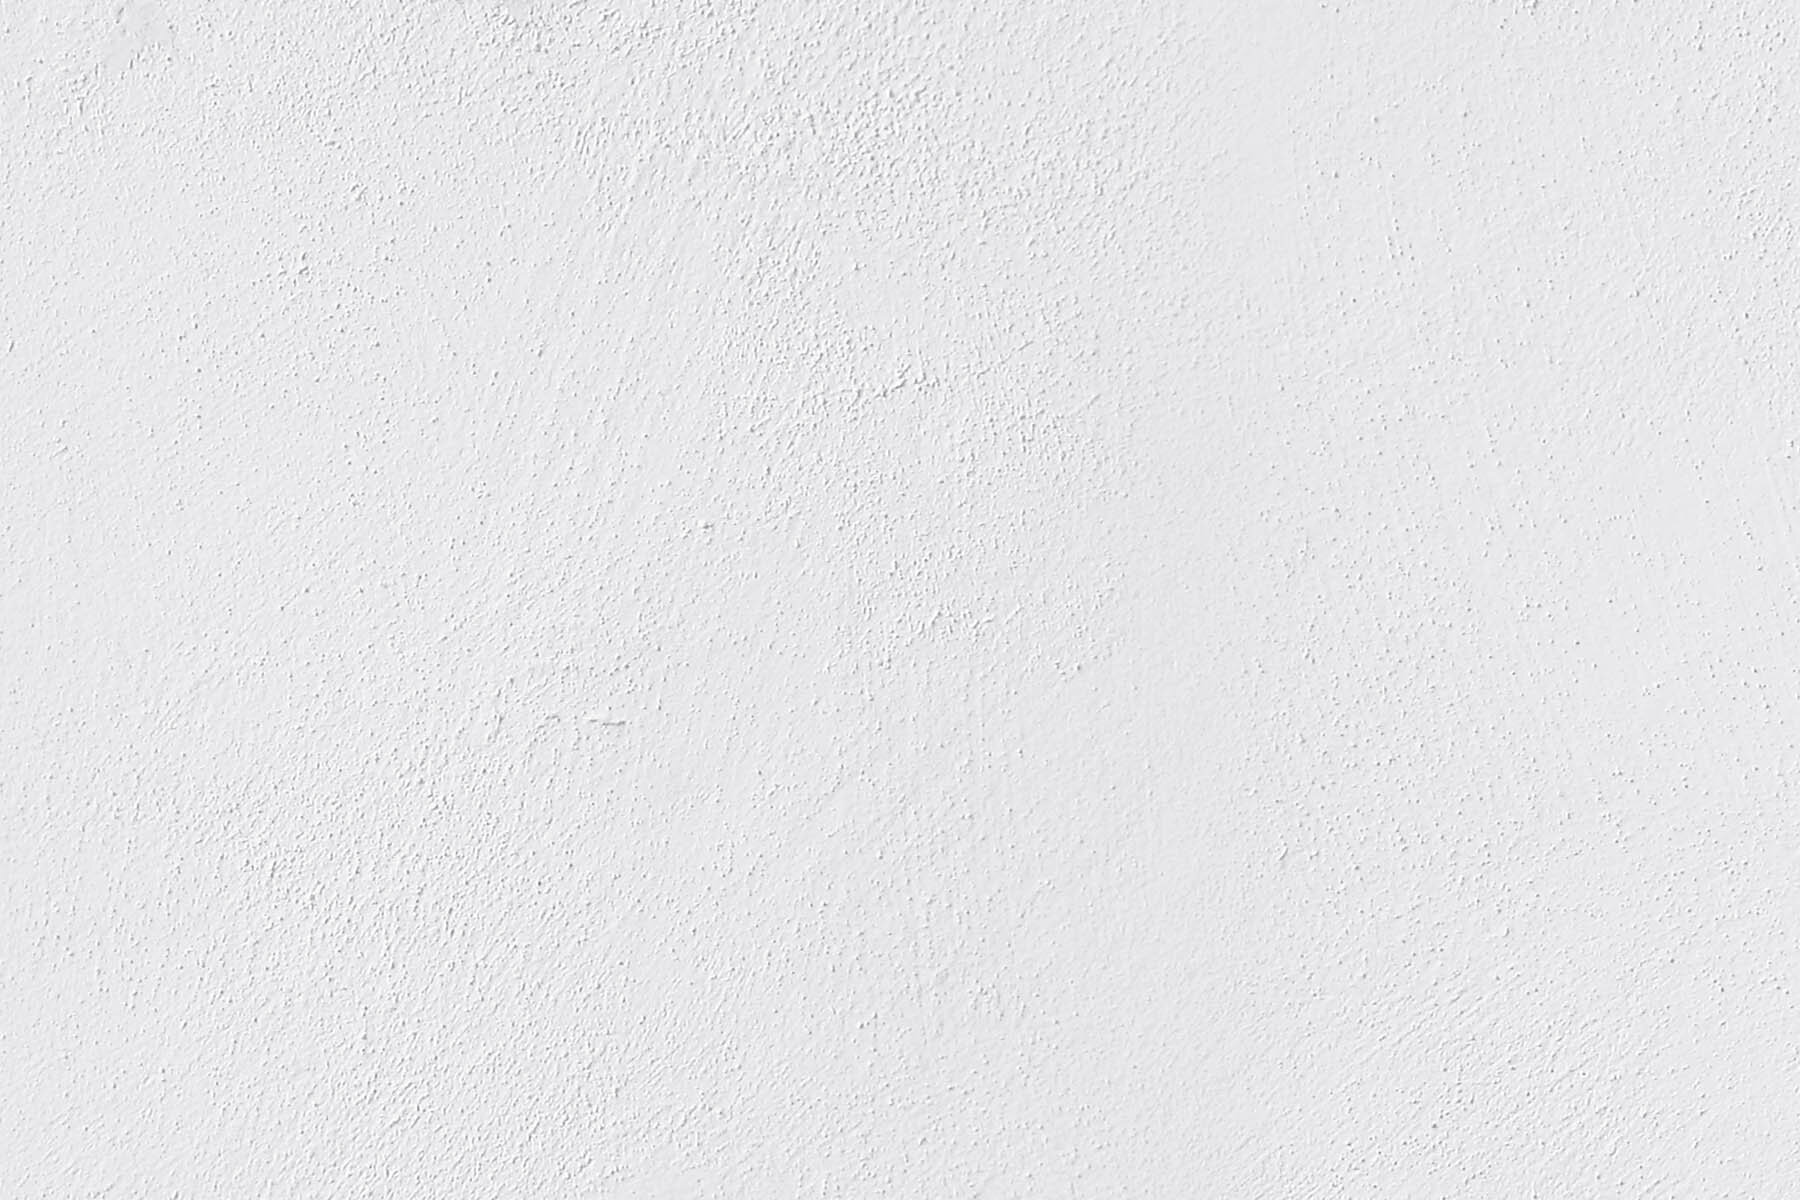 PlateART Duschrückwand mit Motiv weißer Putz